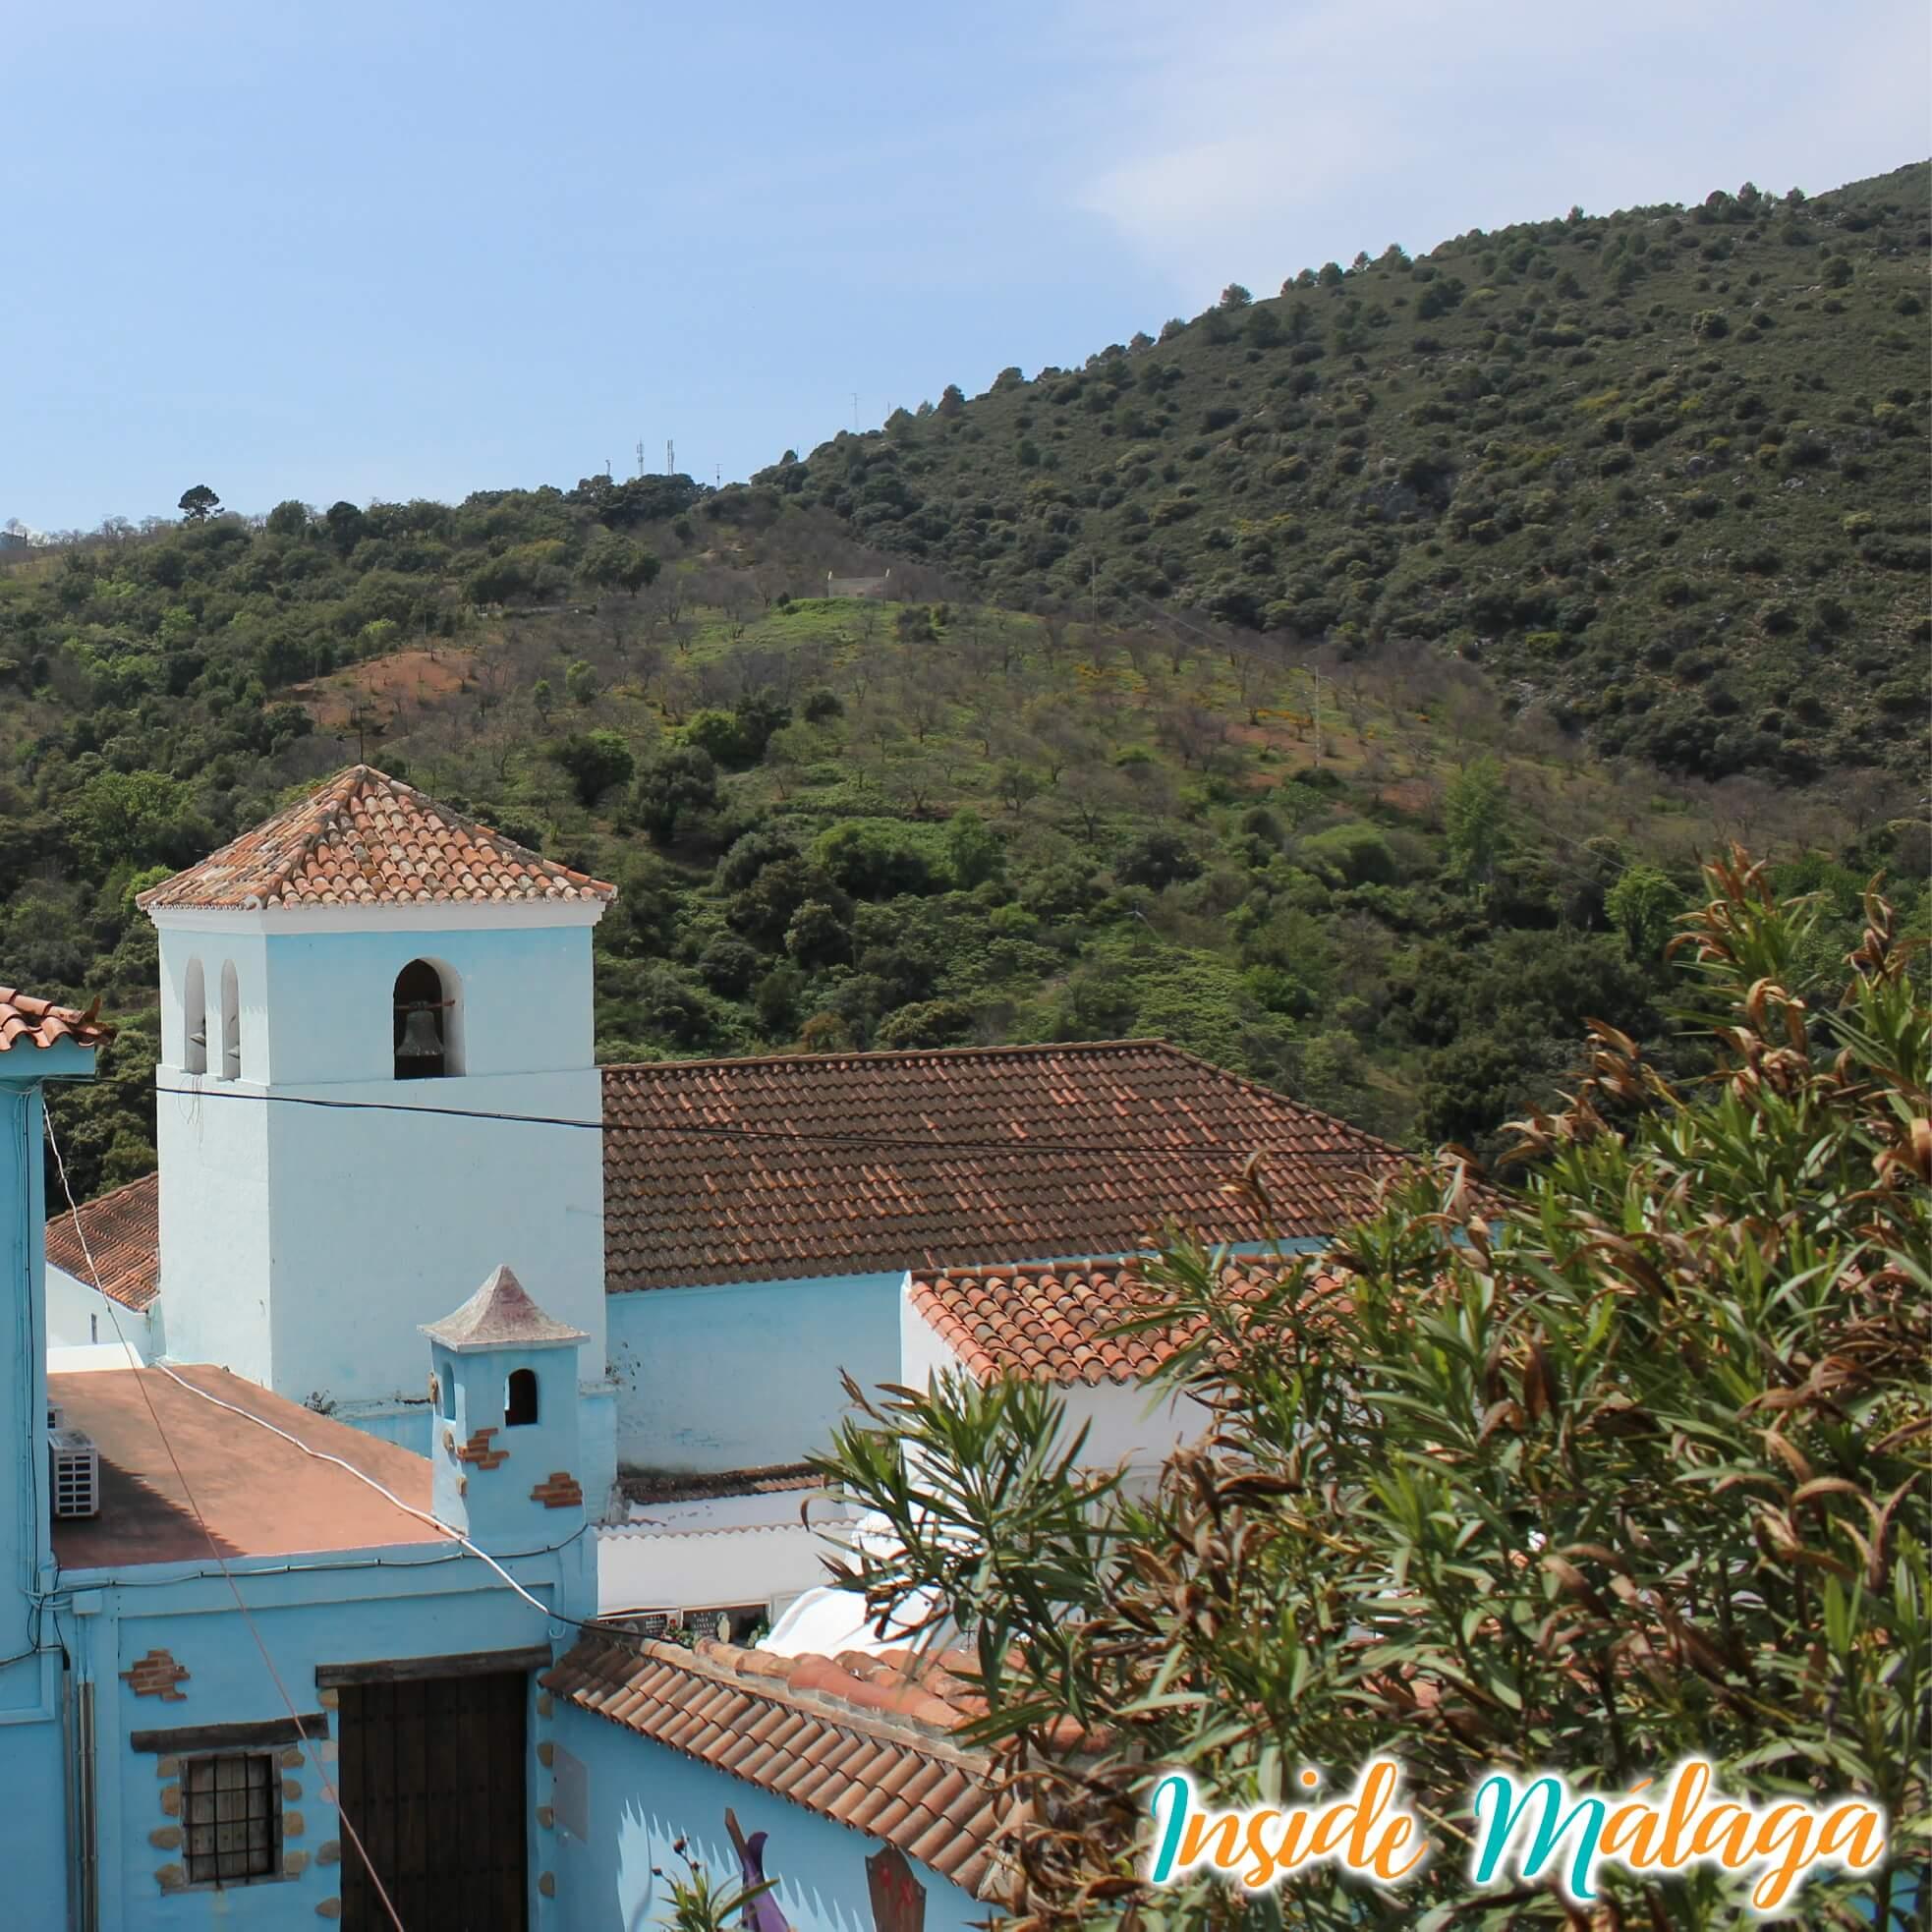 Church Santa Catalina Júzcar